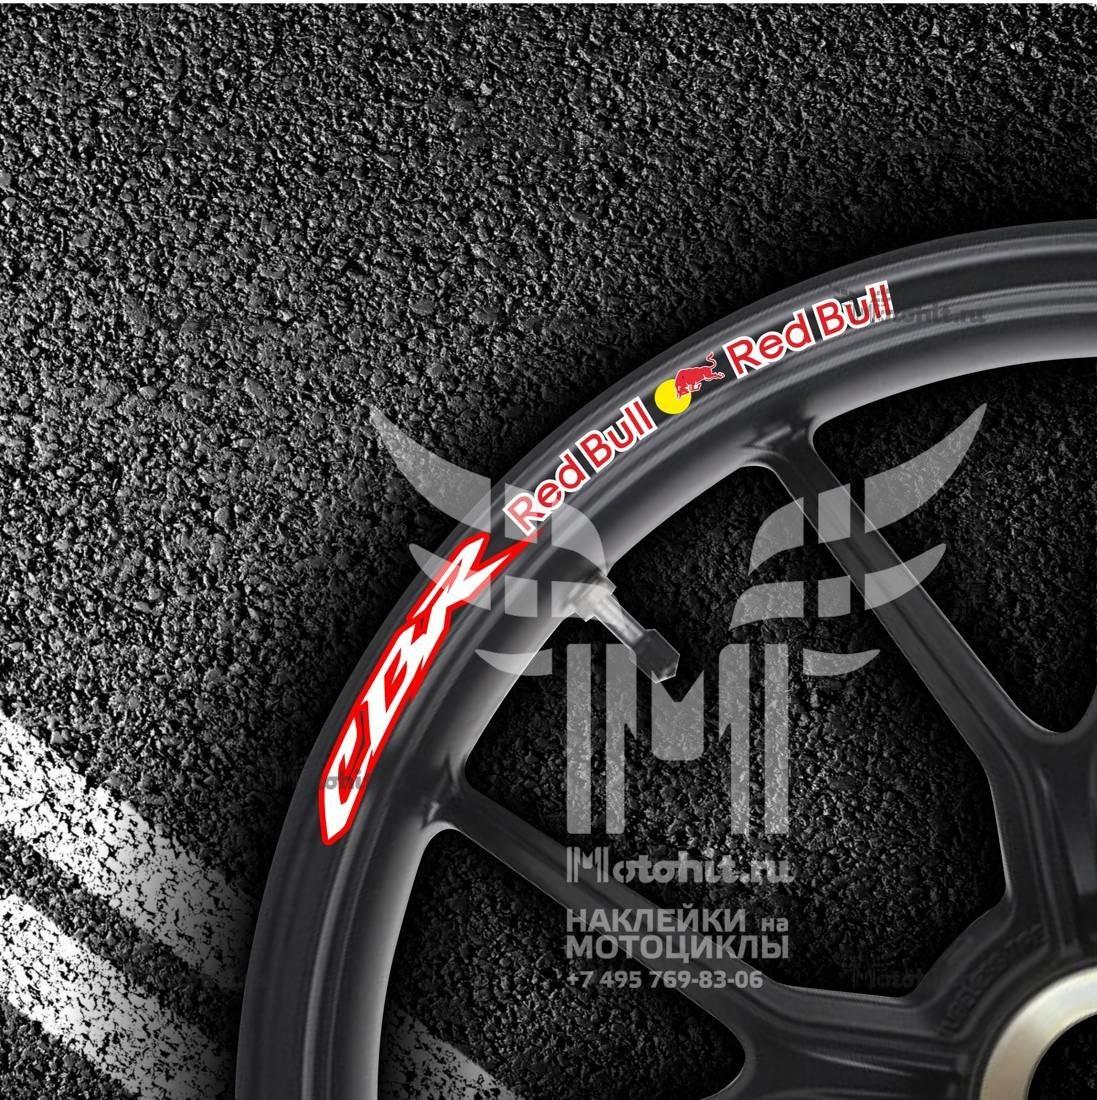 Комплект наклеек на обод колеса мотоцикла HONDA CBR-RED-BULL